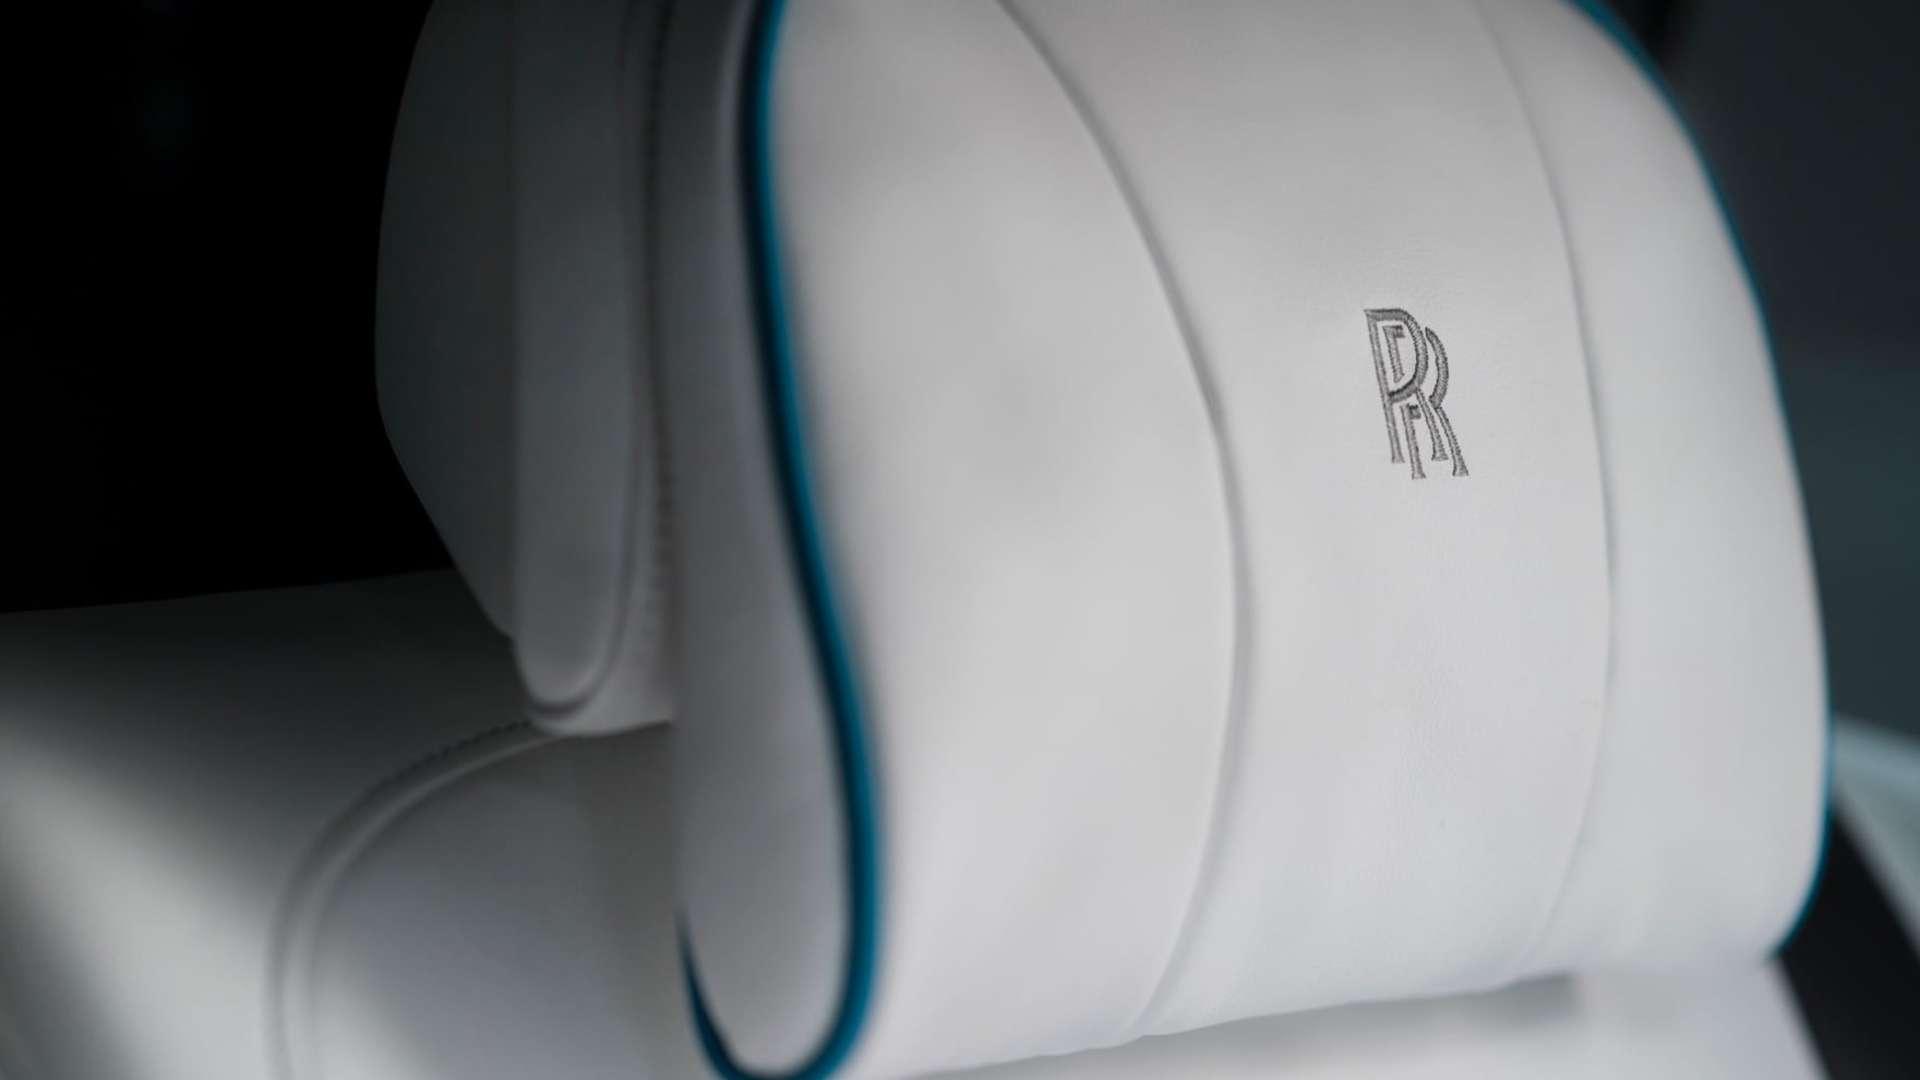 The monogrammed headrest of a Rolls-Royce Cullinan motor car